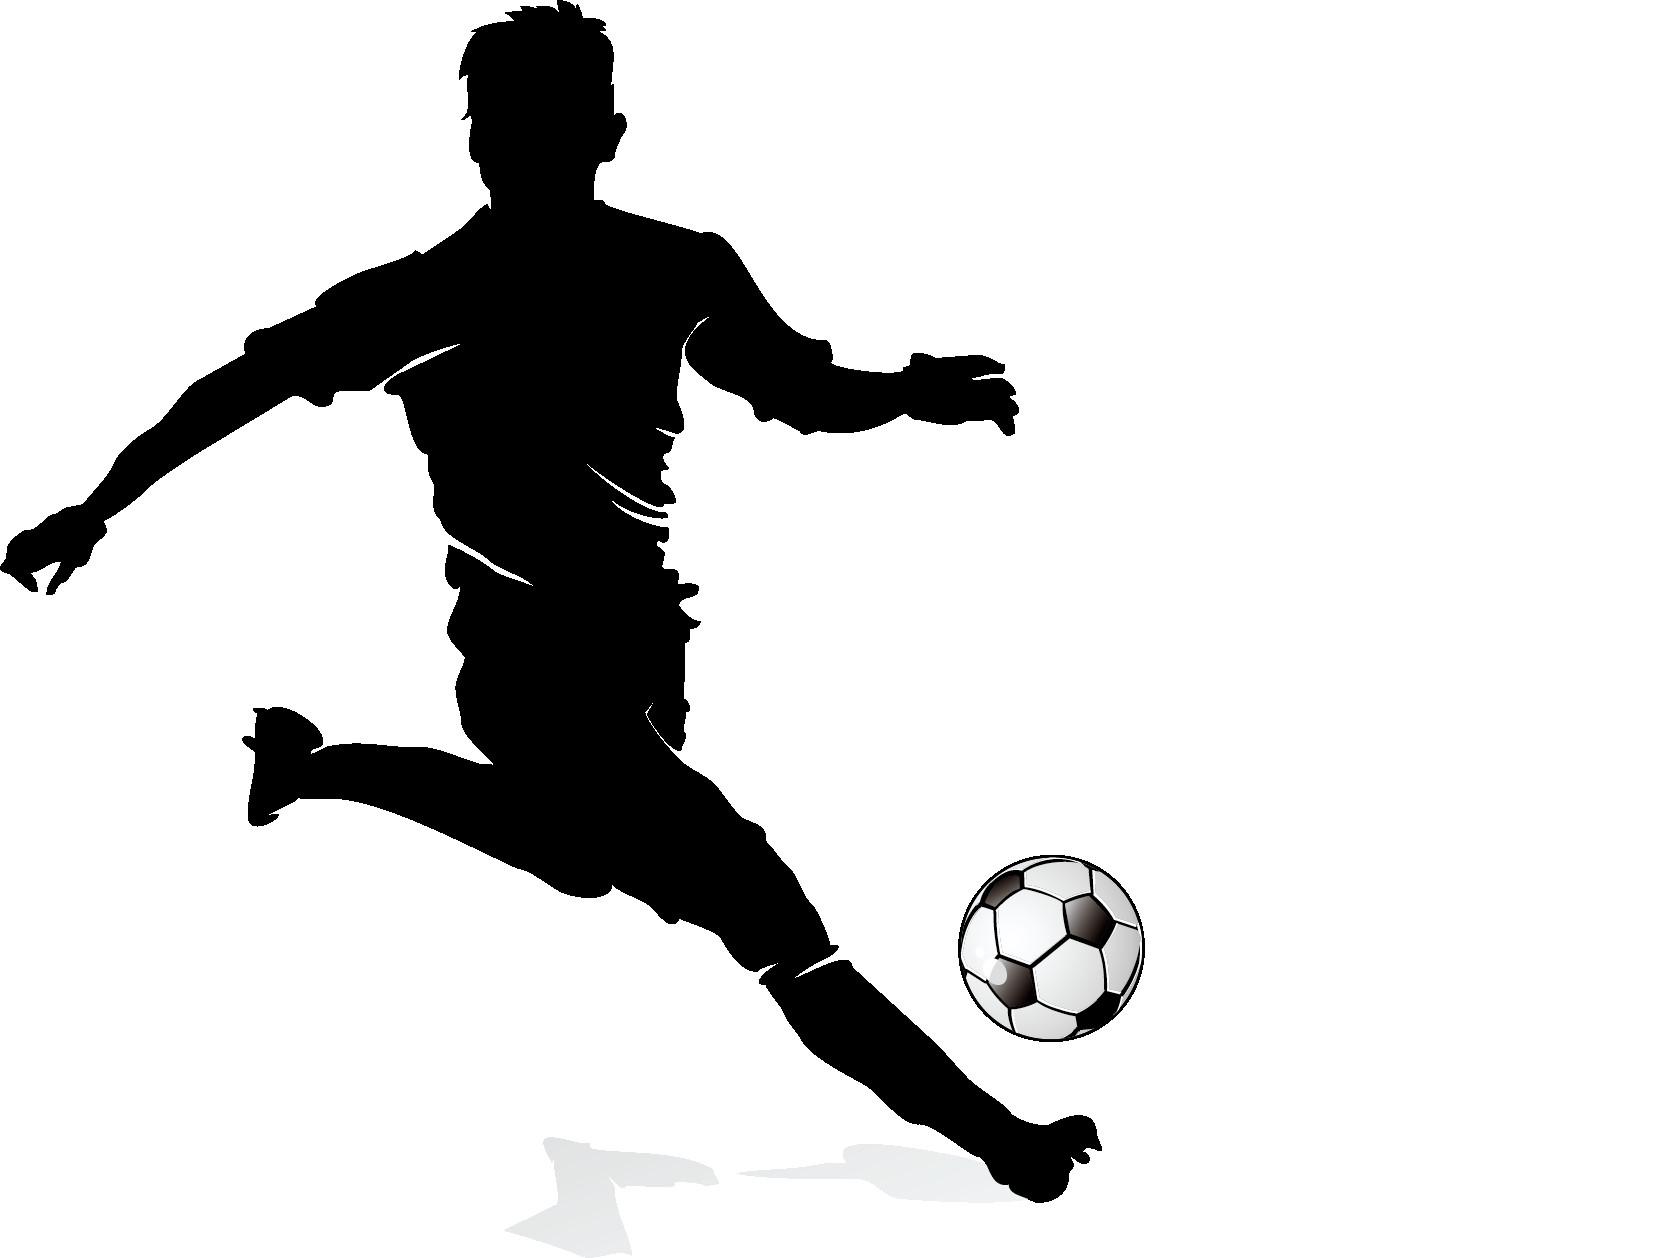 Pngs of soccer jpg Soccer Player Png , (+) Png Group - romolagarai.org< jpg